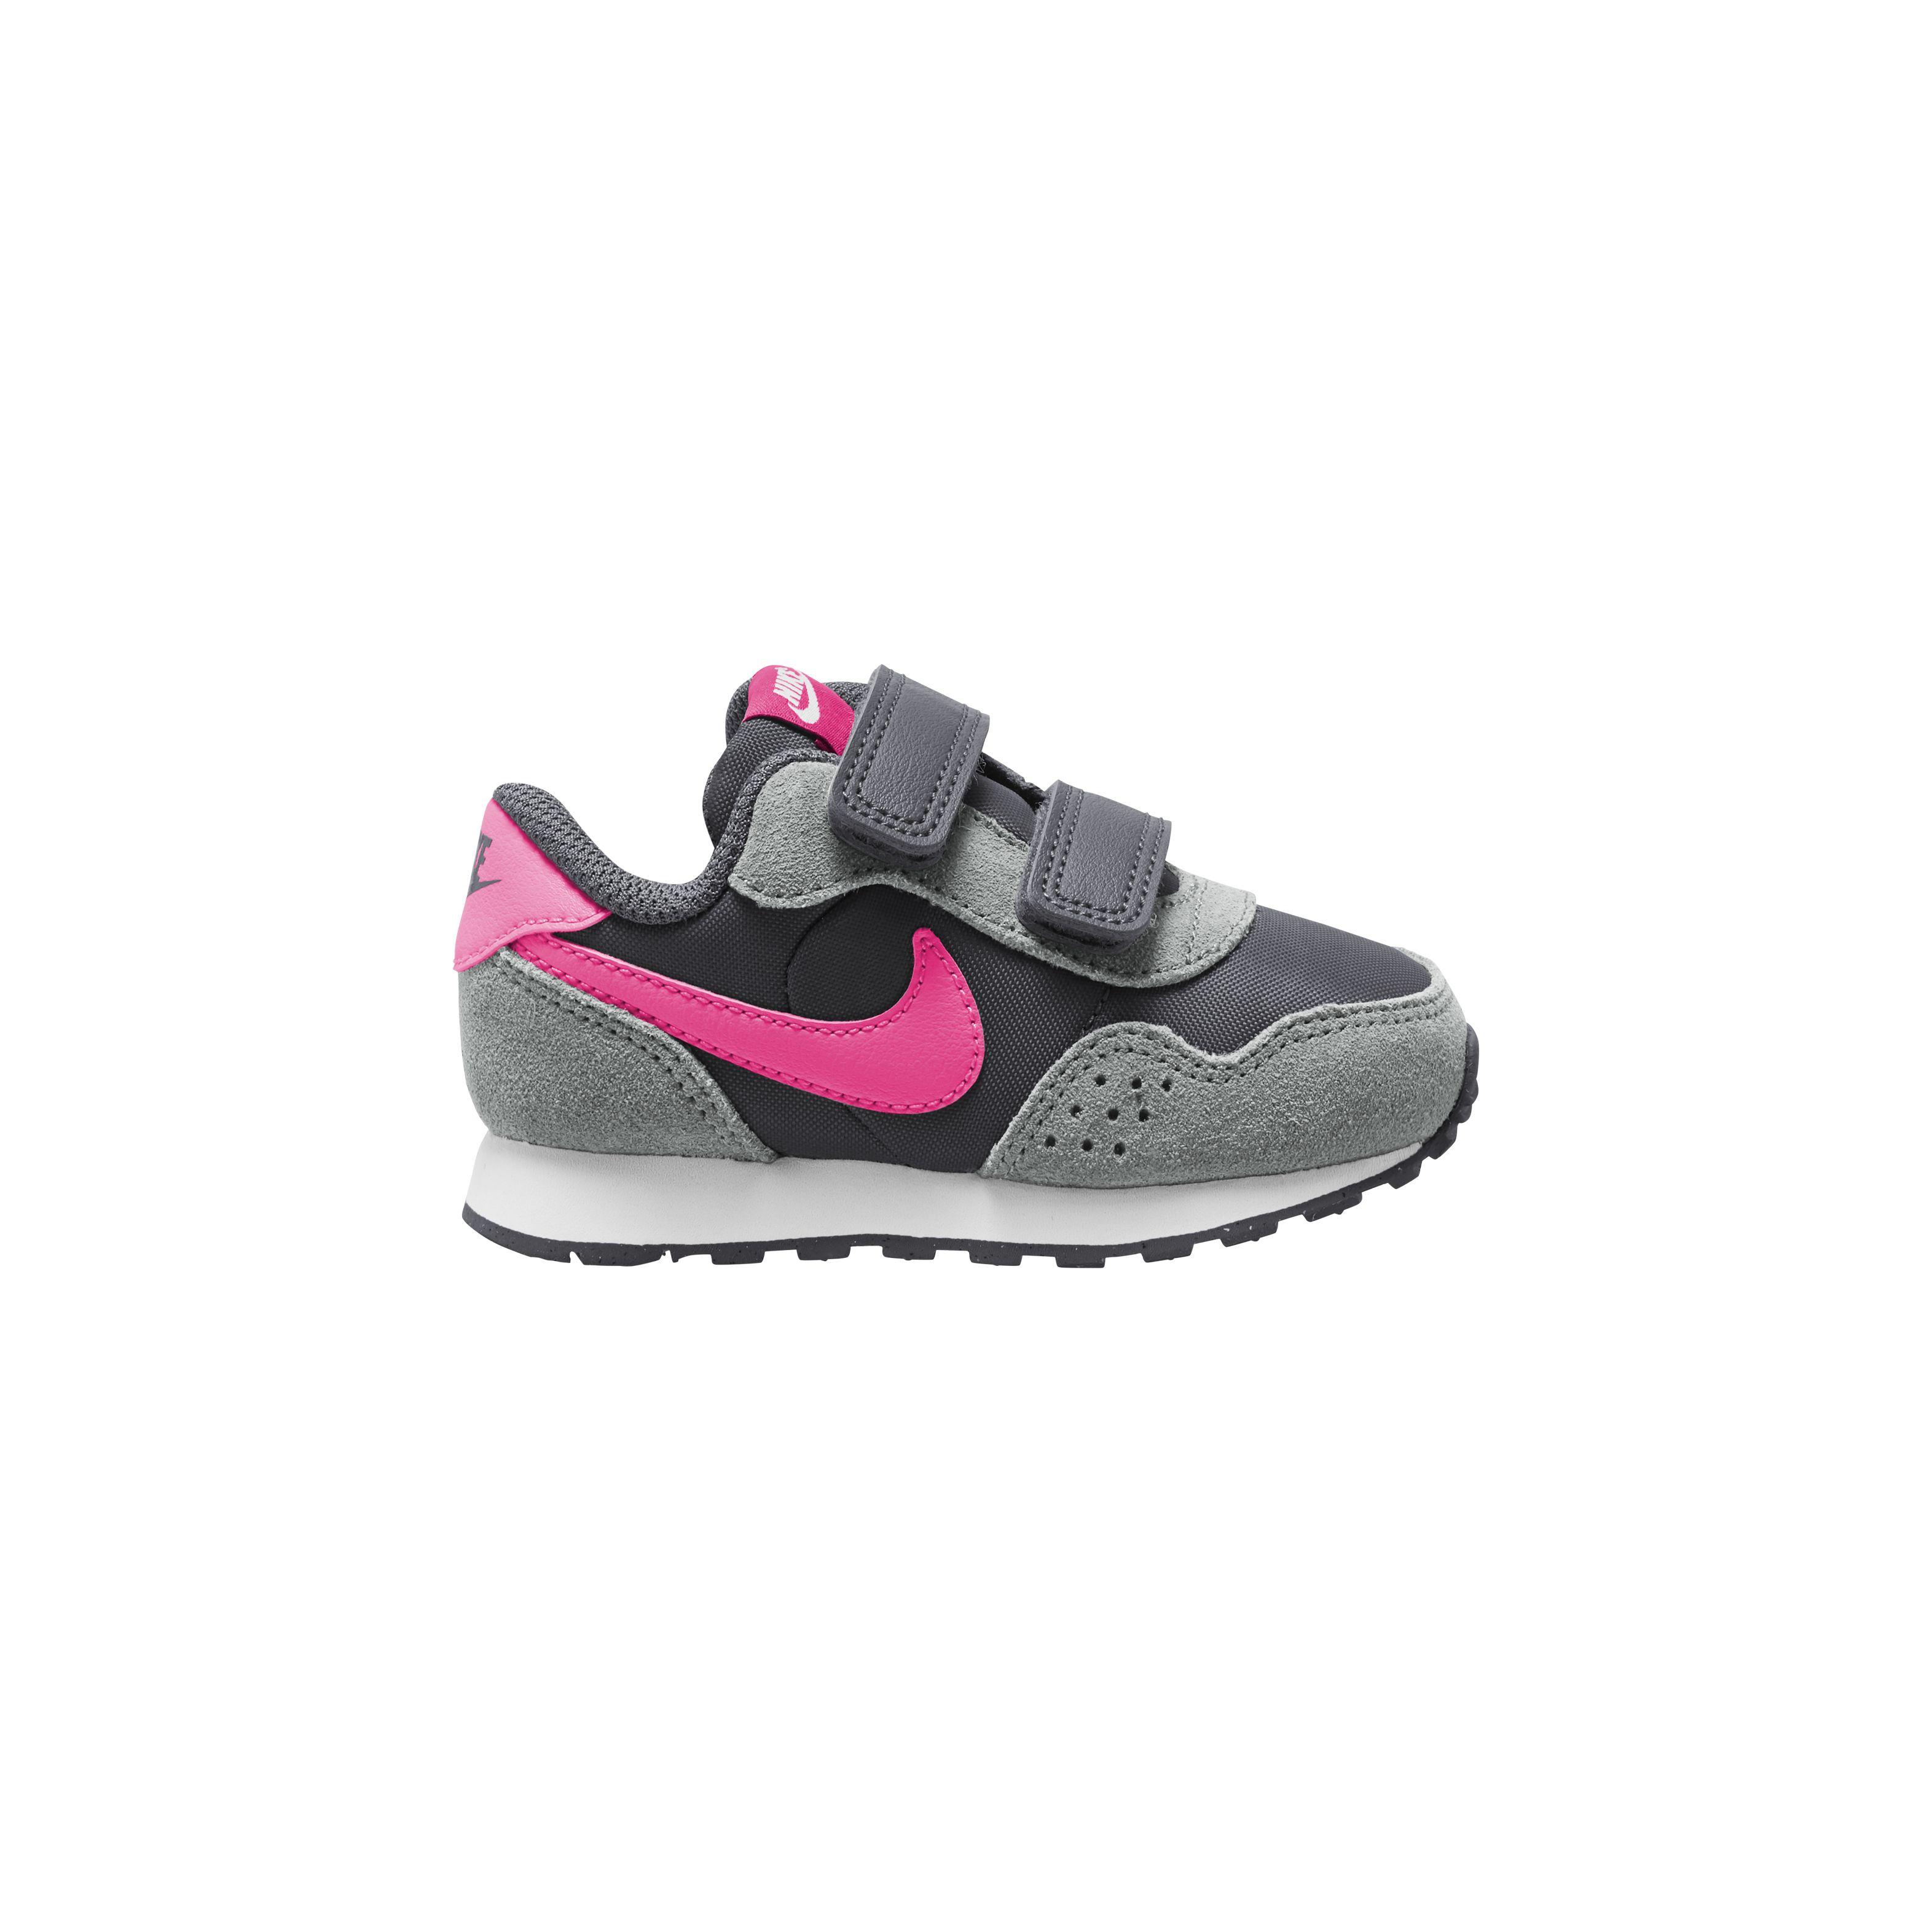 Nike MD Valiant DK SMOKE GREY/HYPER PINK-LT SMOKE GREY